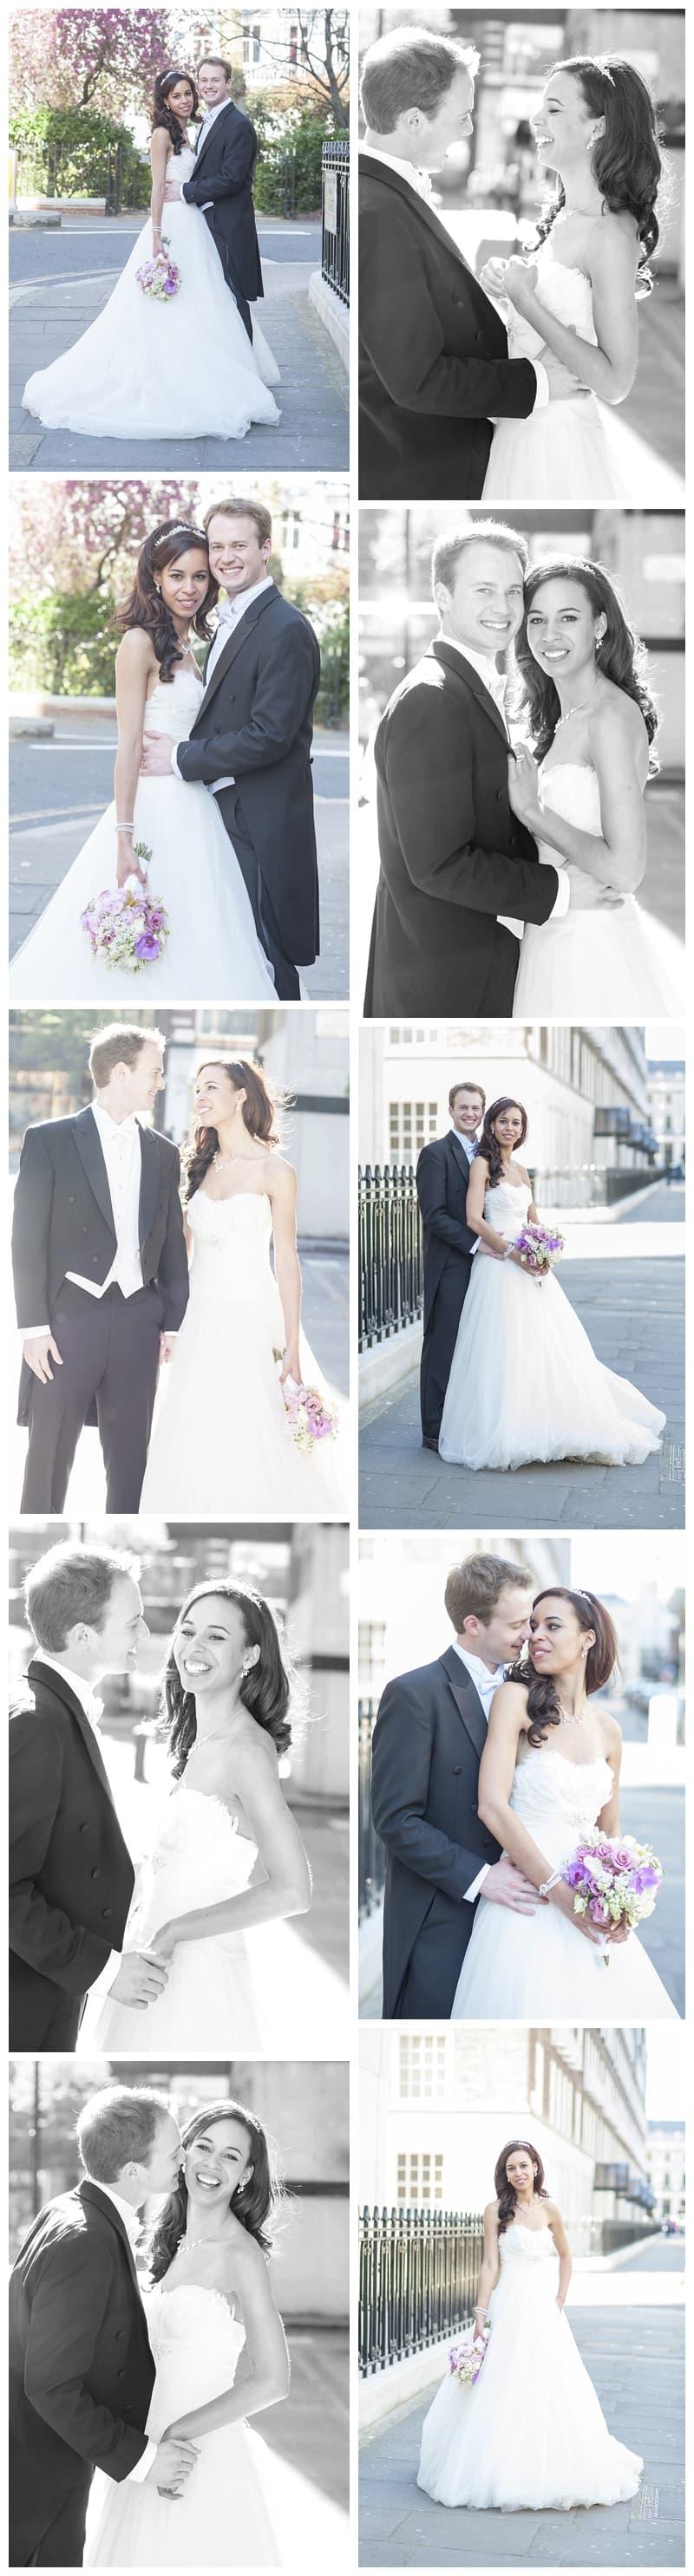 Millenium Hotel Knightsbridge, London, benjamin wetherall wedding photography1